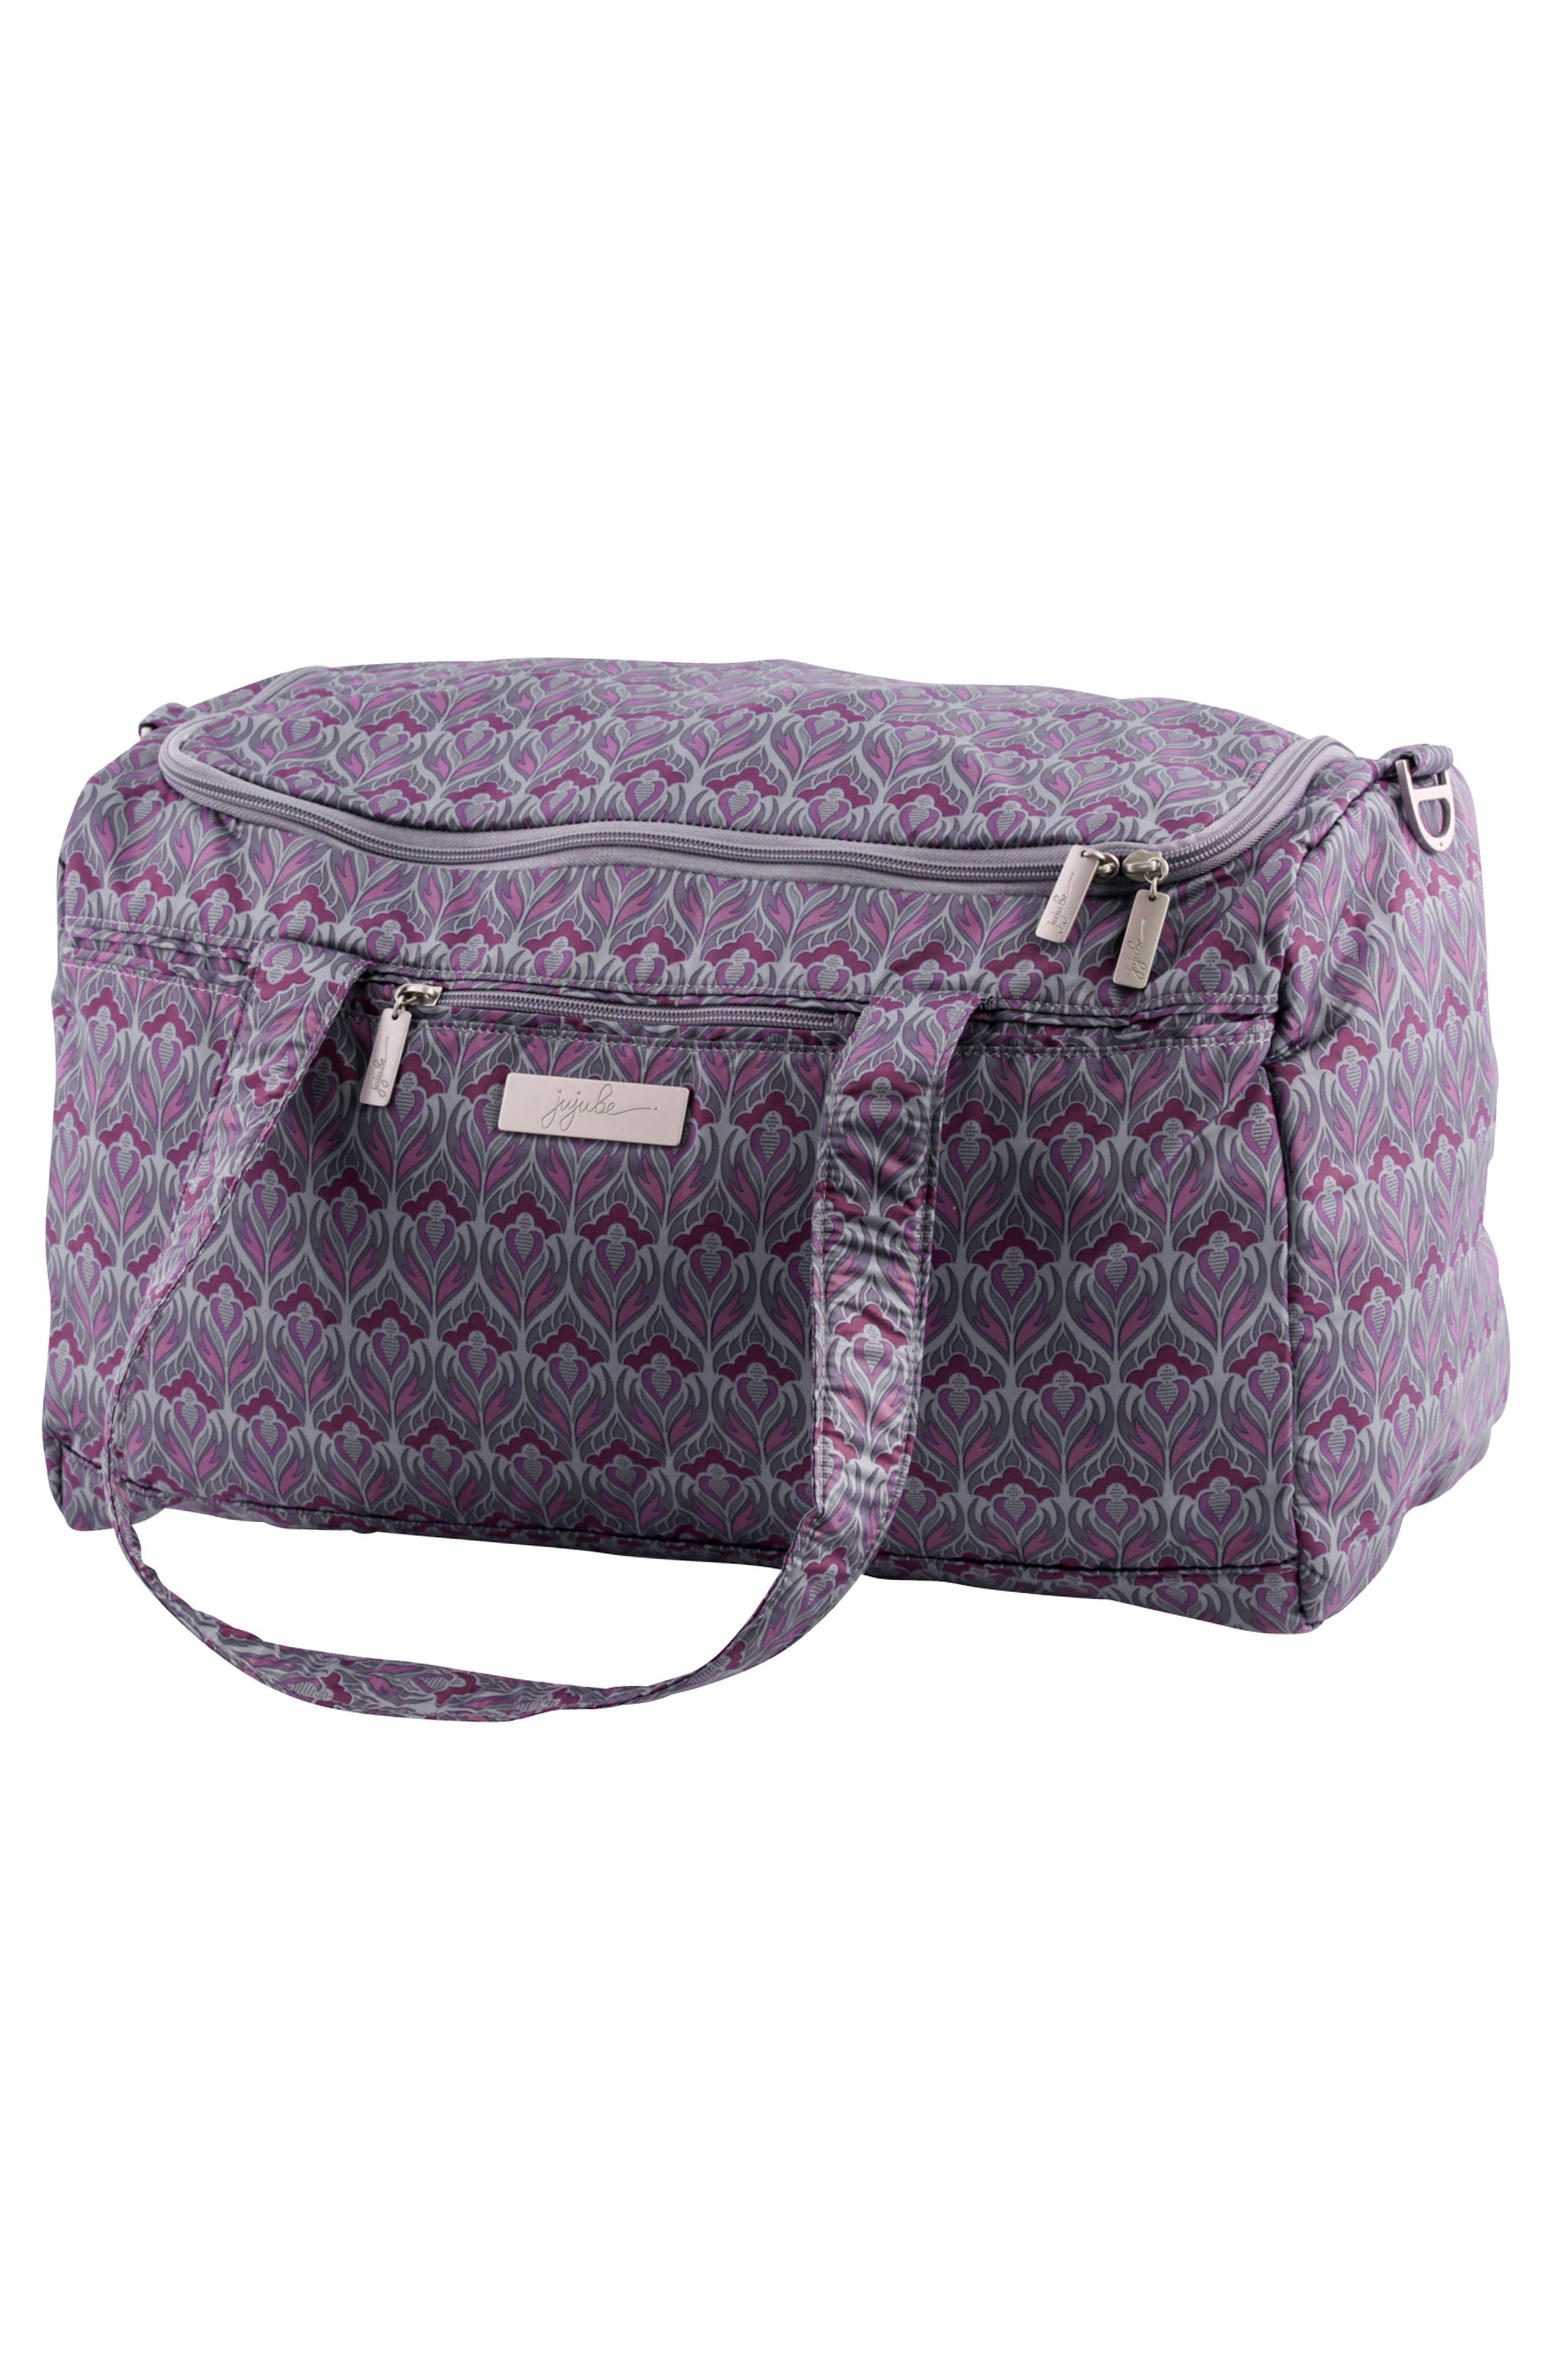 'Starlet' Travel Diaper Bag,                             Alternate thumbnail 4, color,                             Amethyst Ice